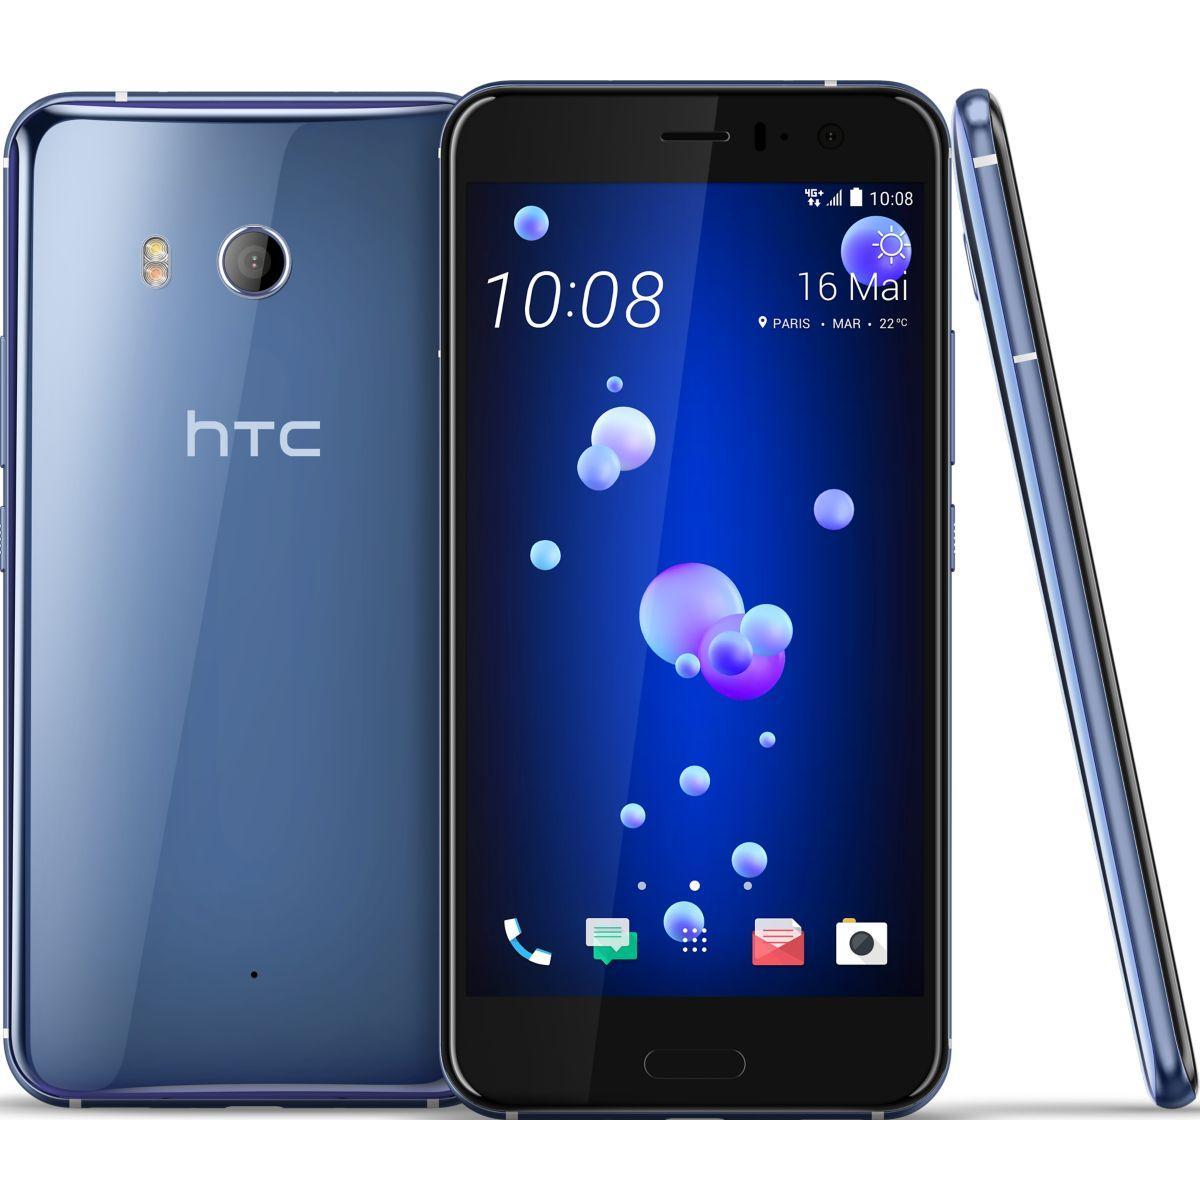 Smartphone htc u11 chrome 64 go - 3% de remise immédiate avec le code : multi3